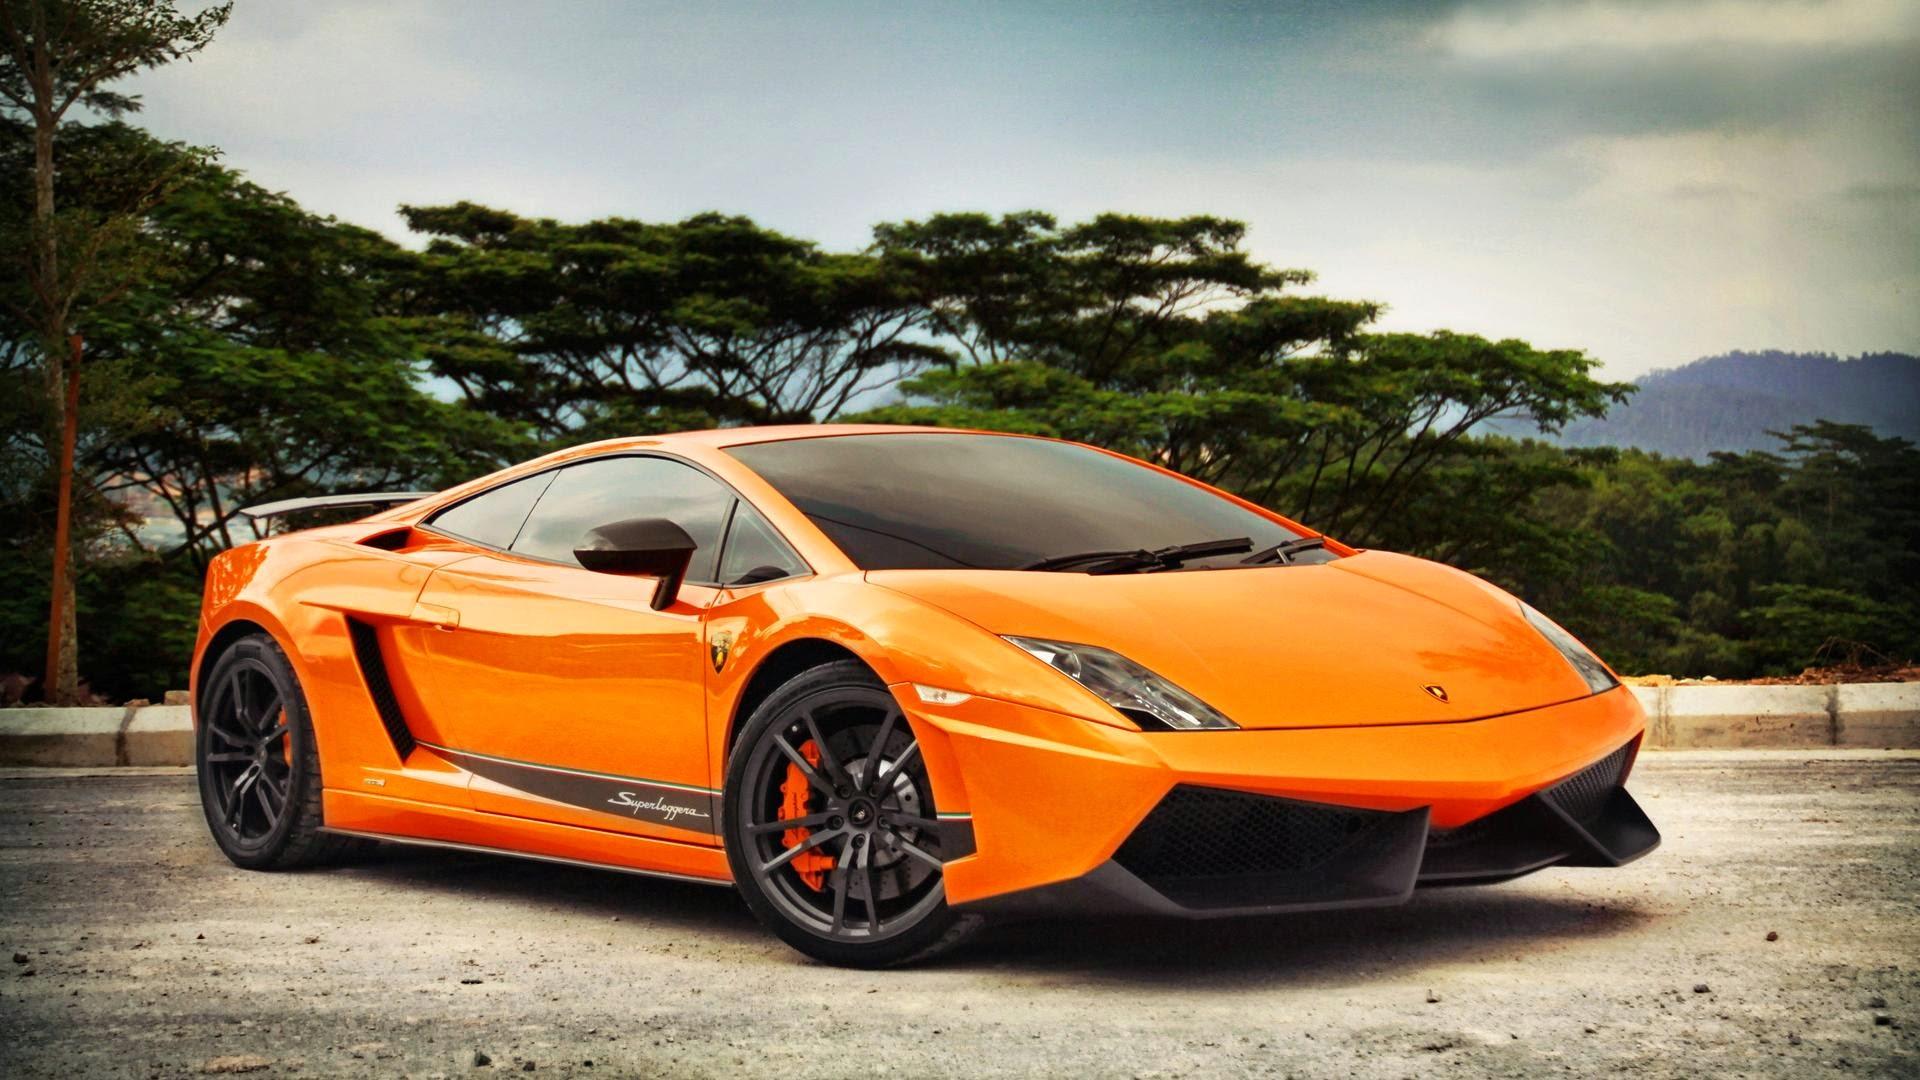 New Lamborghini Gallardo Sports Cars Hd Wallpaper